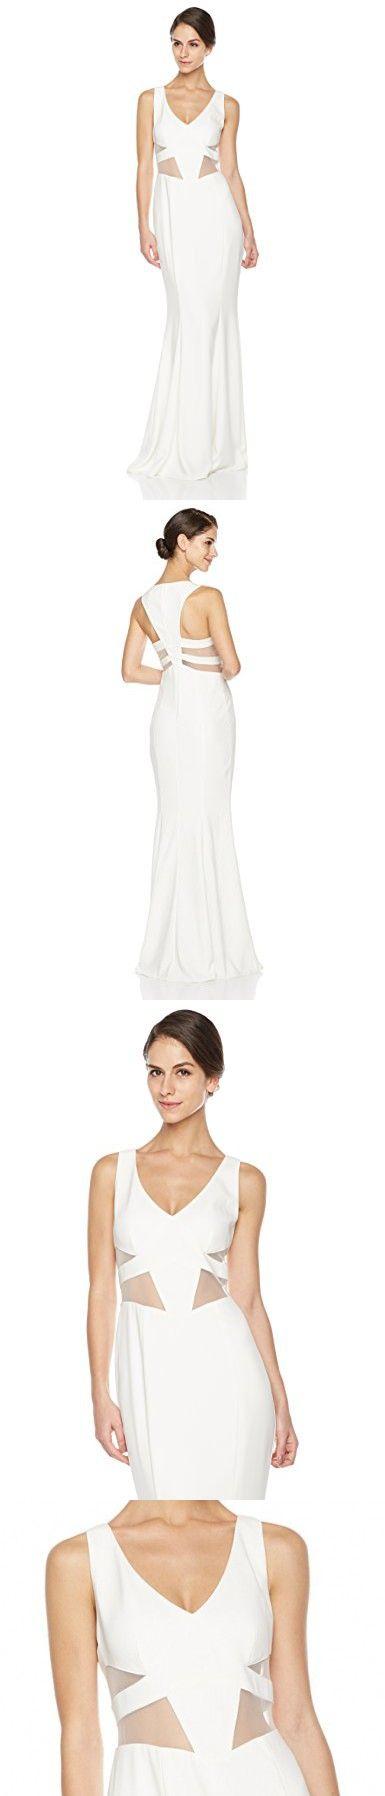 Social Graces Womens V-Neck Sleeveless Mesh Waist Cutout Stretch Crepe Mermaid Skirt Maxi Dress Gown